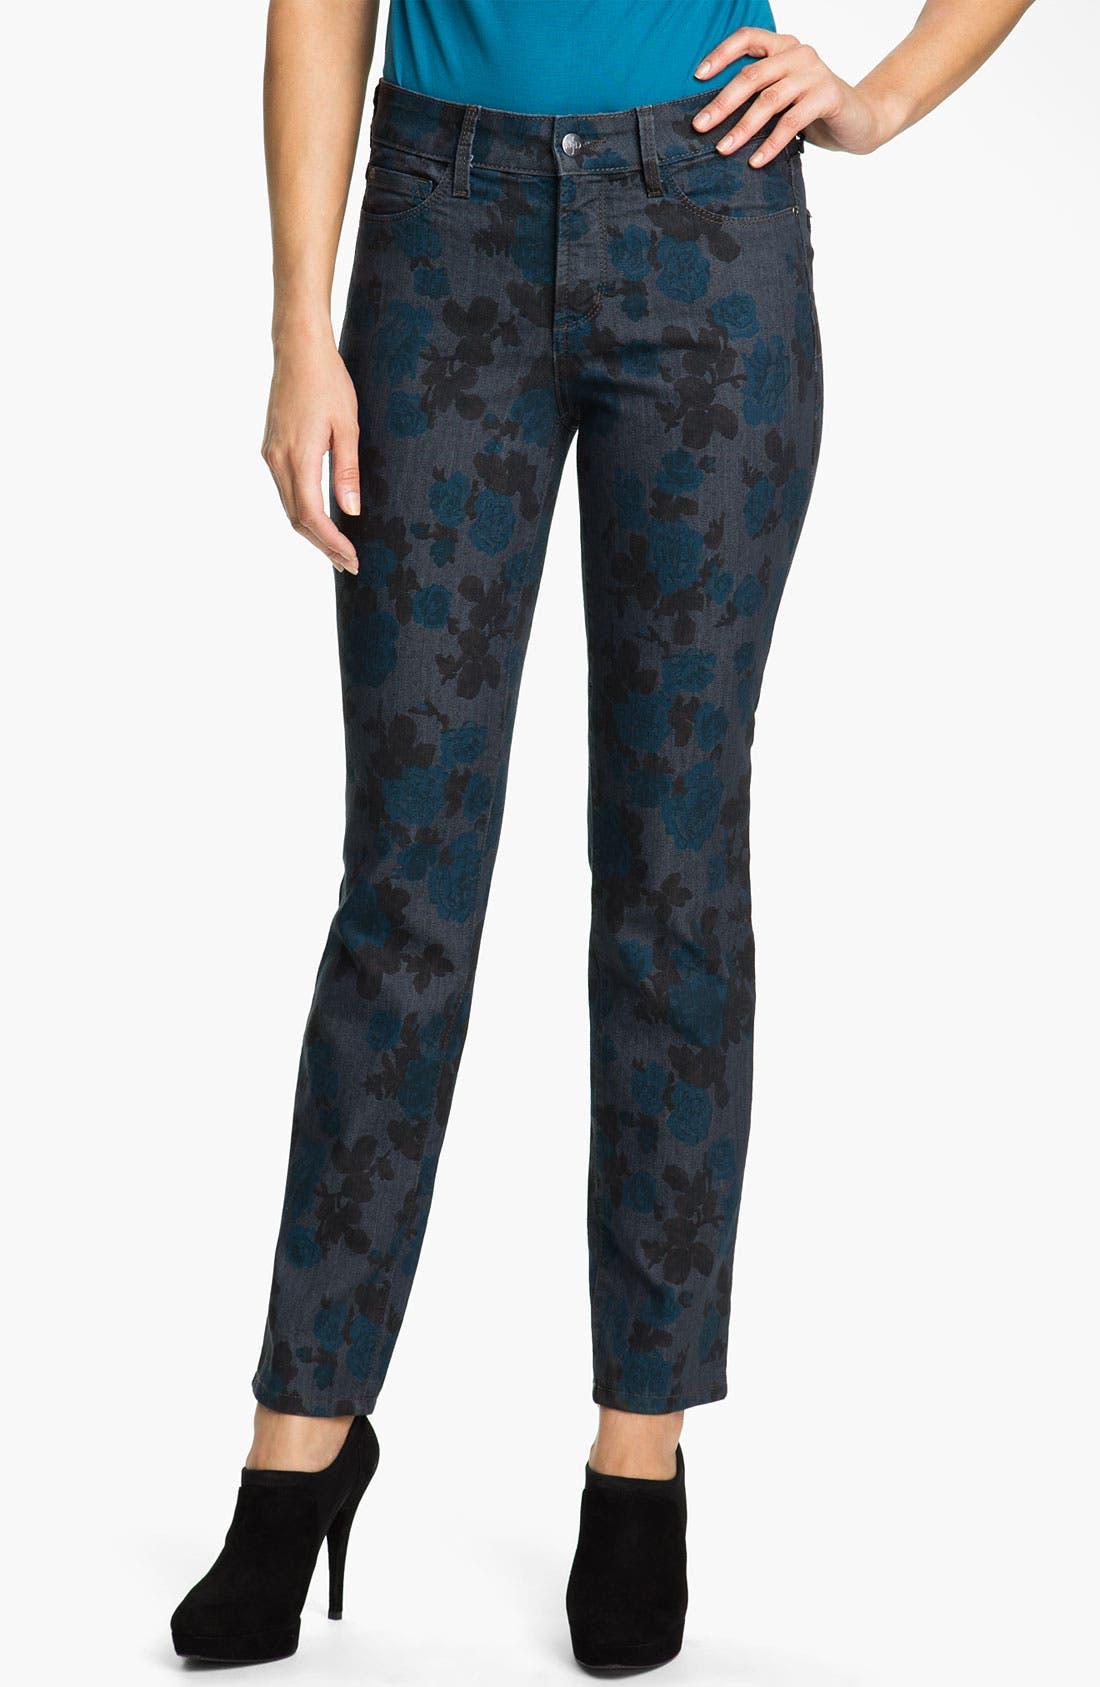 Alternate Image 1 Selected - NYDJ 'Sheri - Wild Rose' Print Skinny Twill Jeans